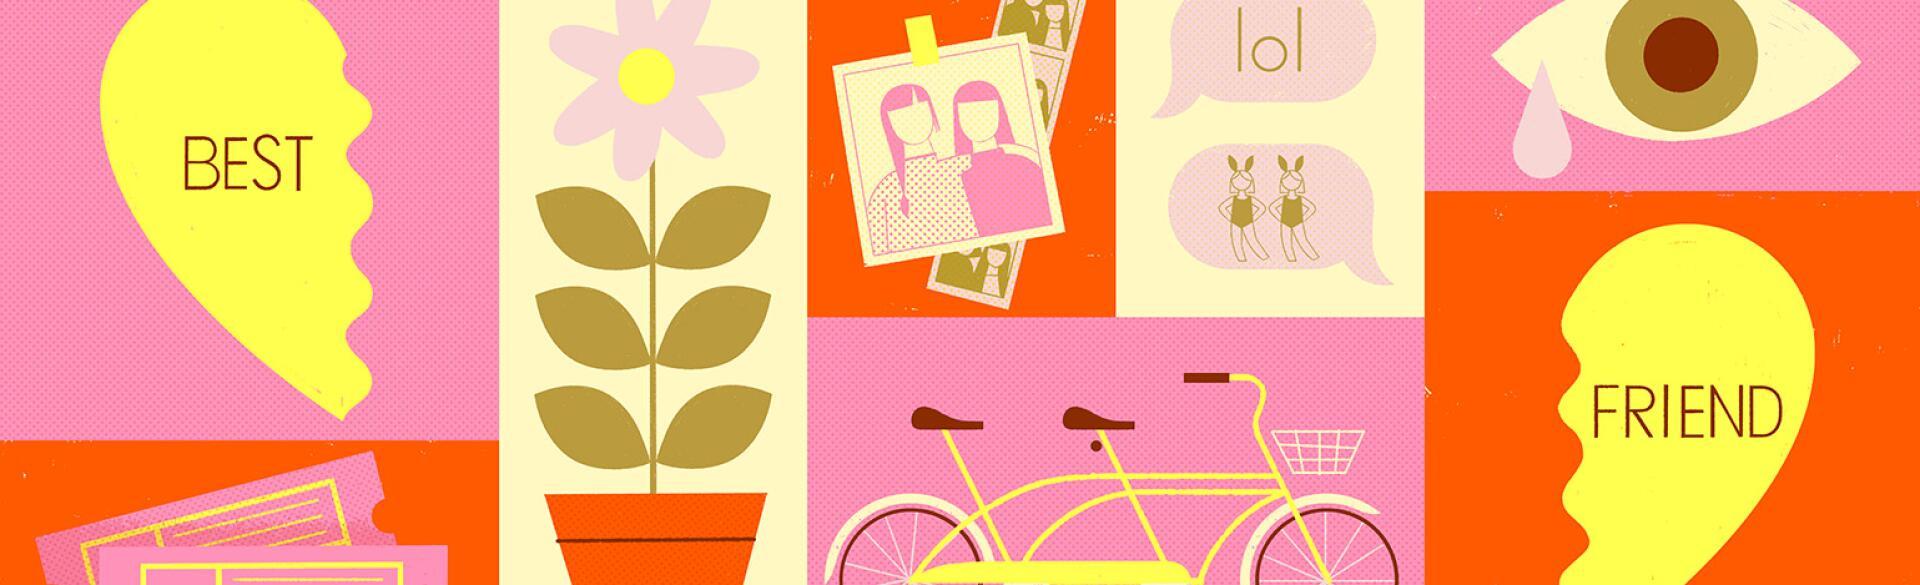 illustration_of_bff_references_by_loris_lora_1540x600.jpg